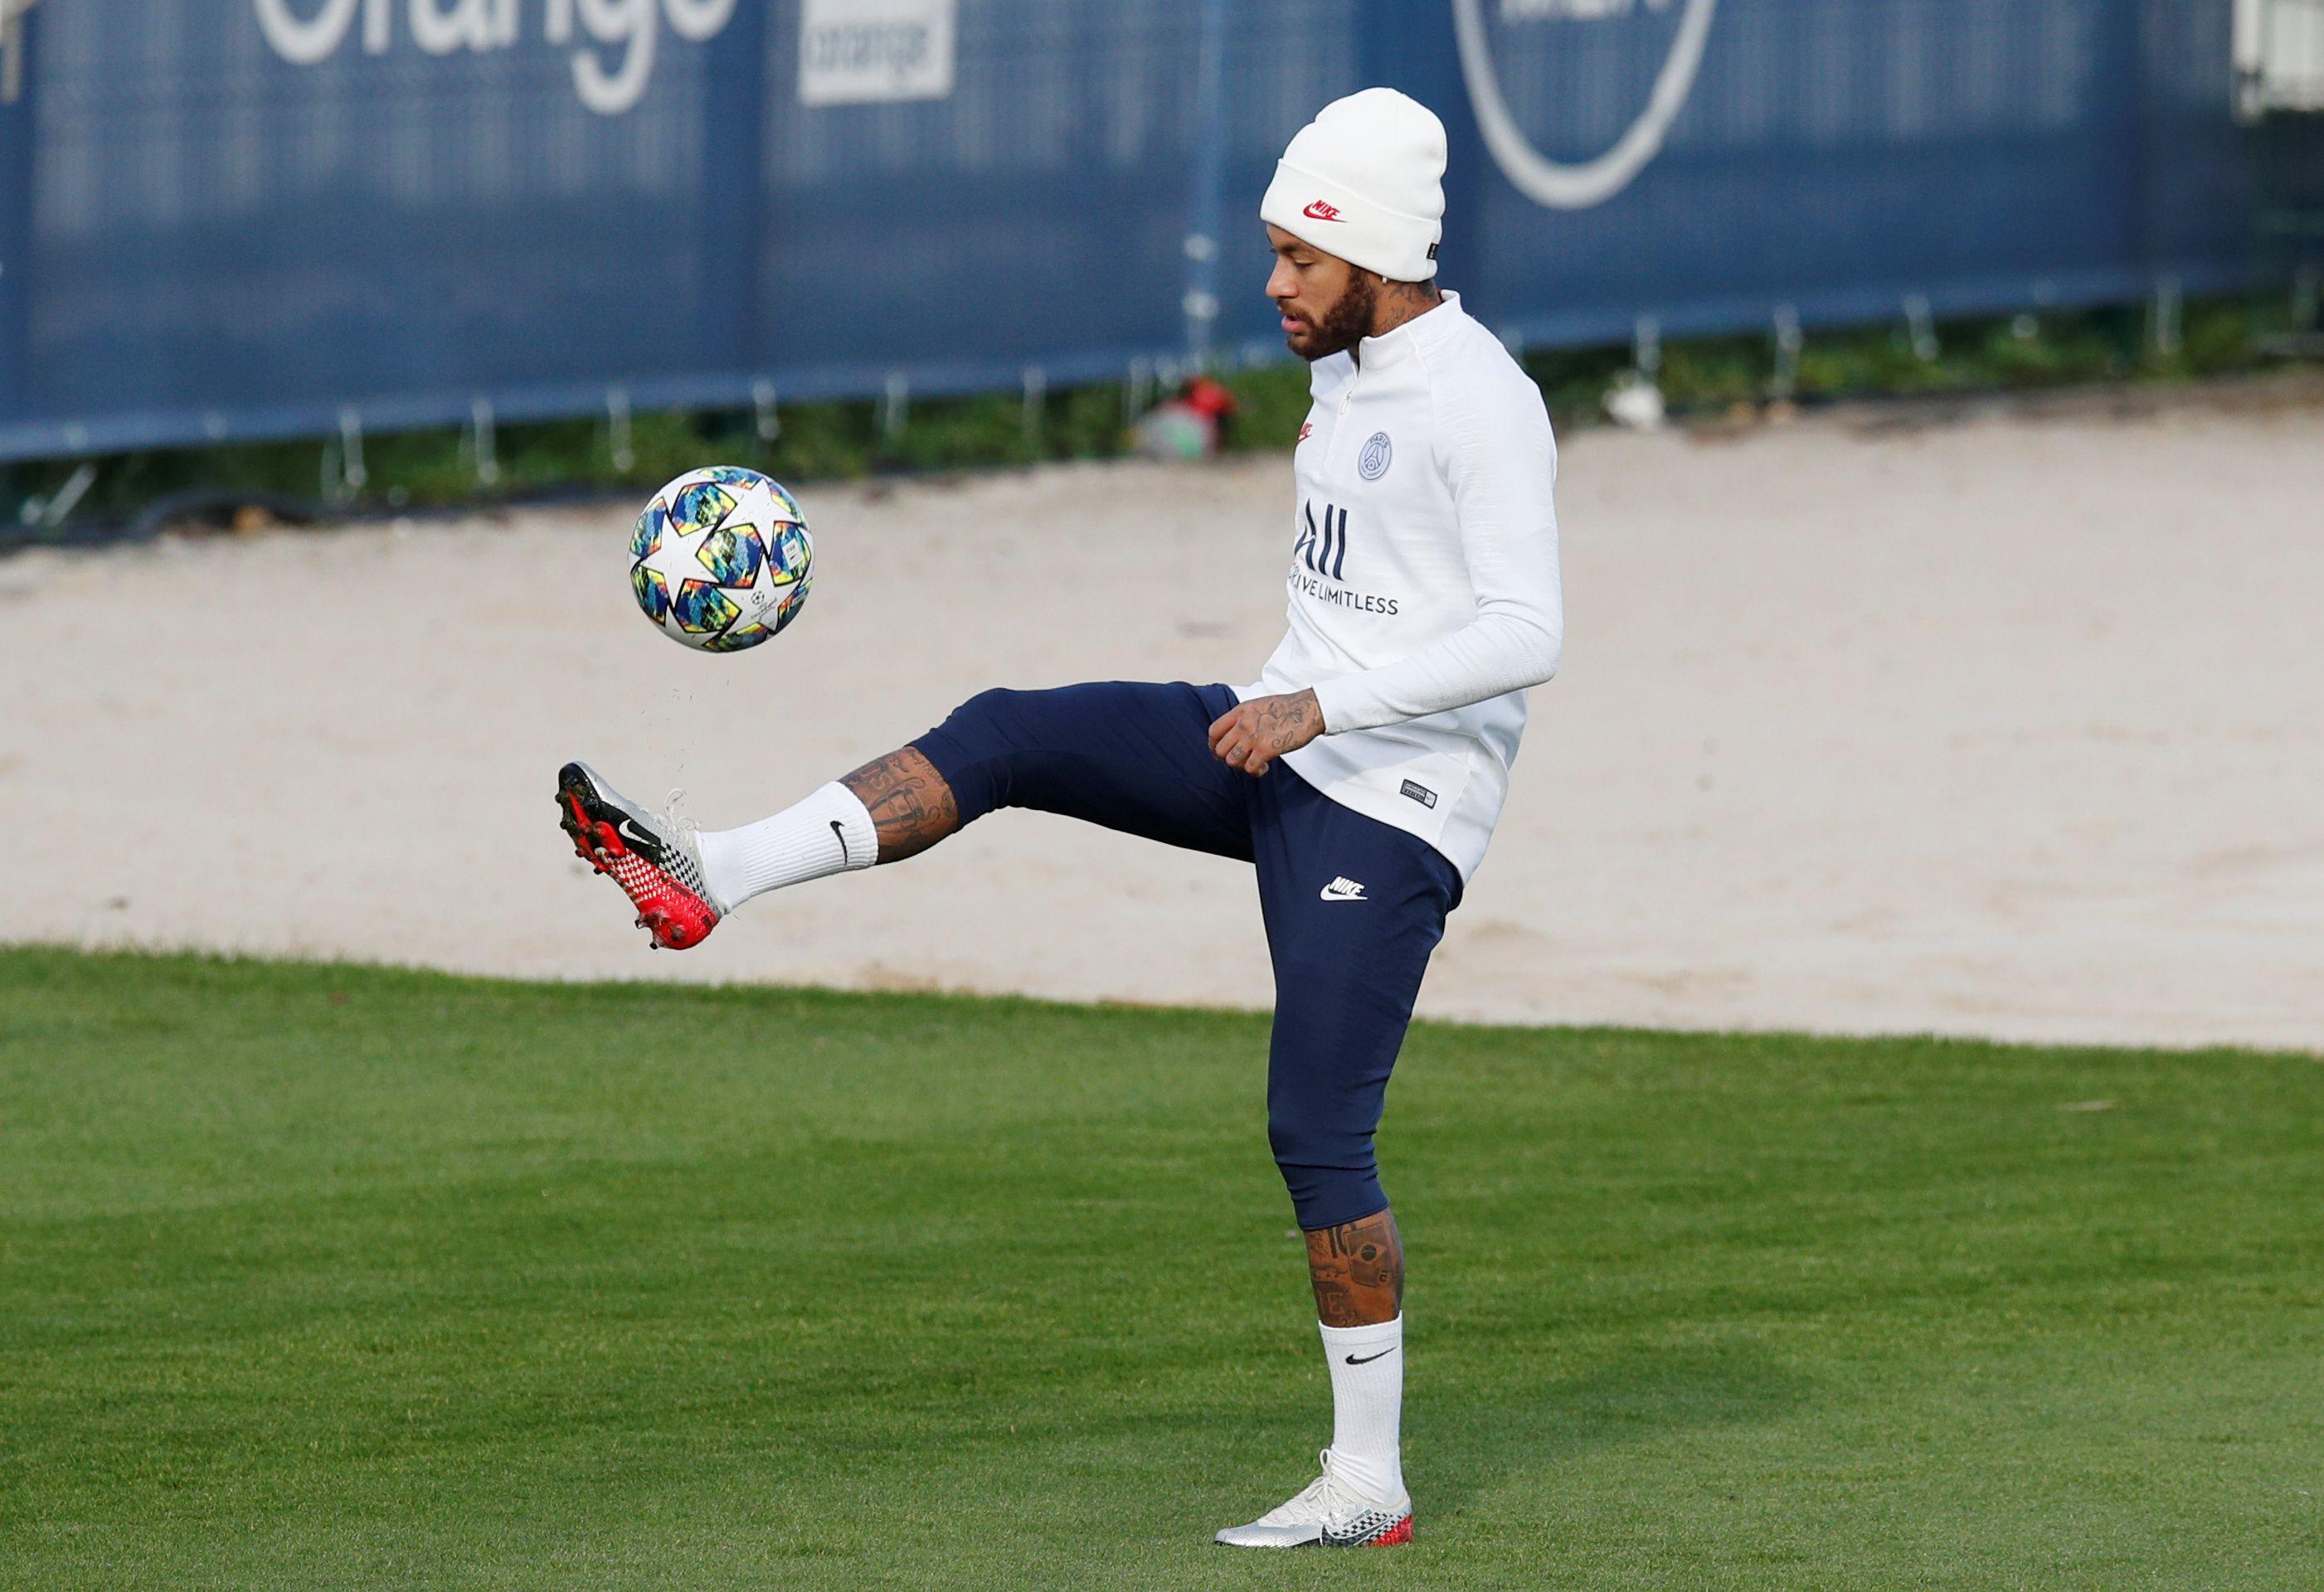 Football - Transferts - PSG : Neymar prolongé ? A priori, rien ne bougera avant début 2020